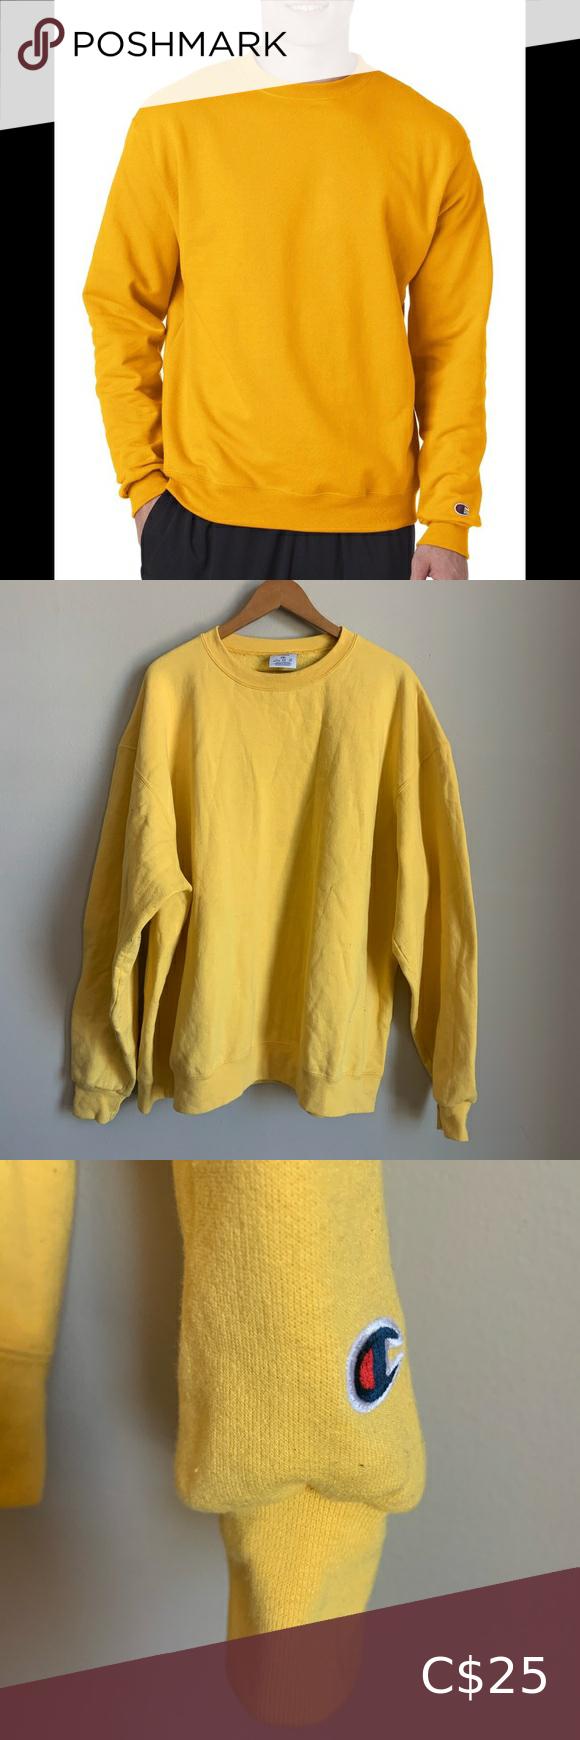 Champion Eco Fleece Crewneck Sweater Size Xxl Crew Neck Sweater Sweater Sizes Hurley Jacket [ 1740 x 580 Pixel ]